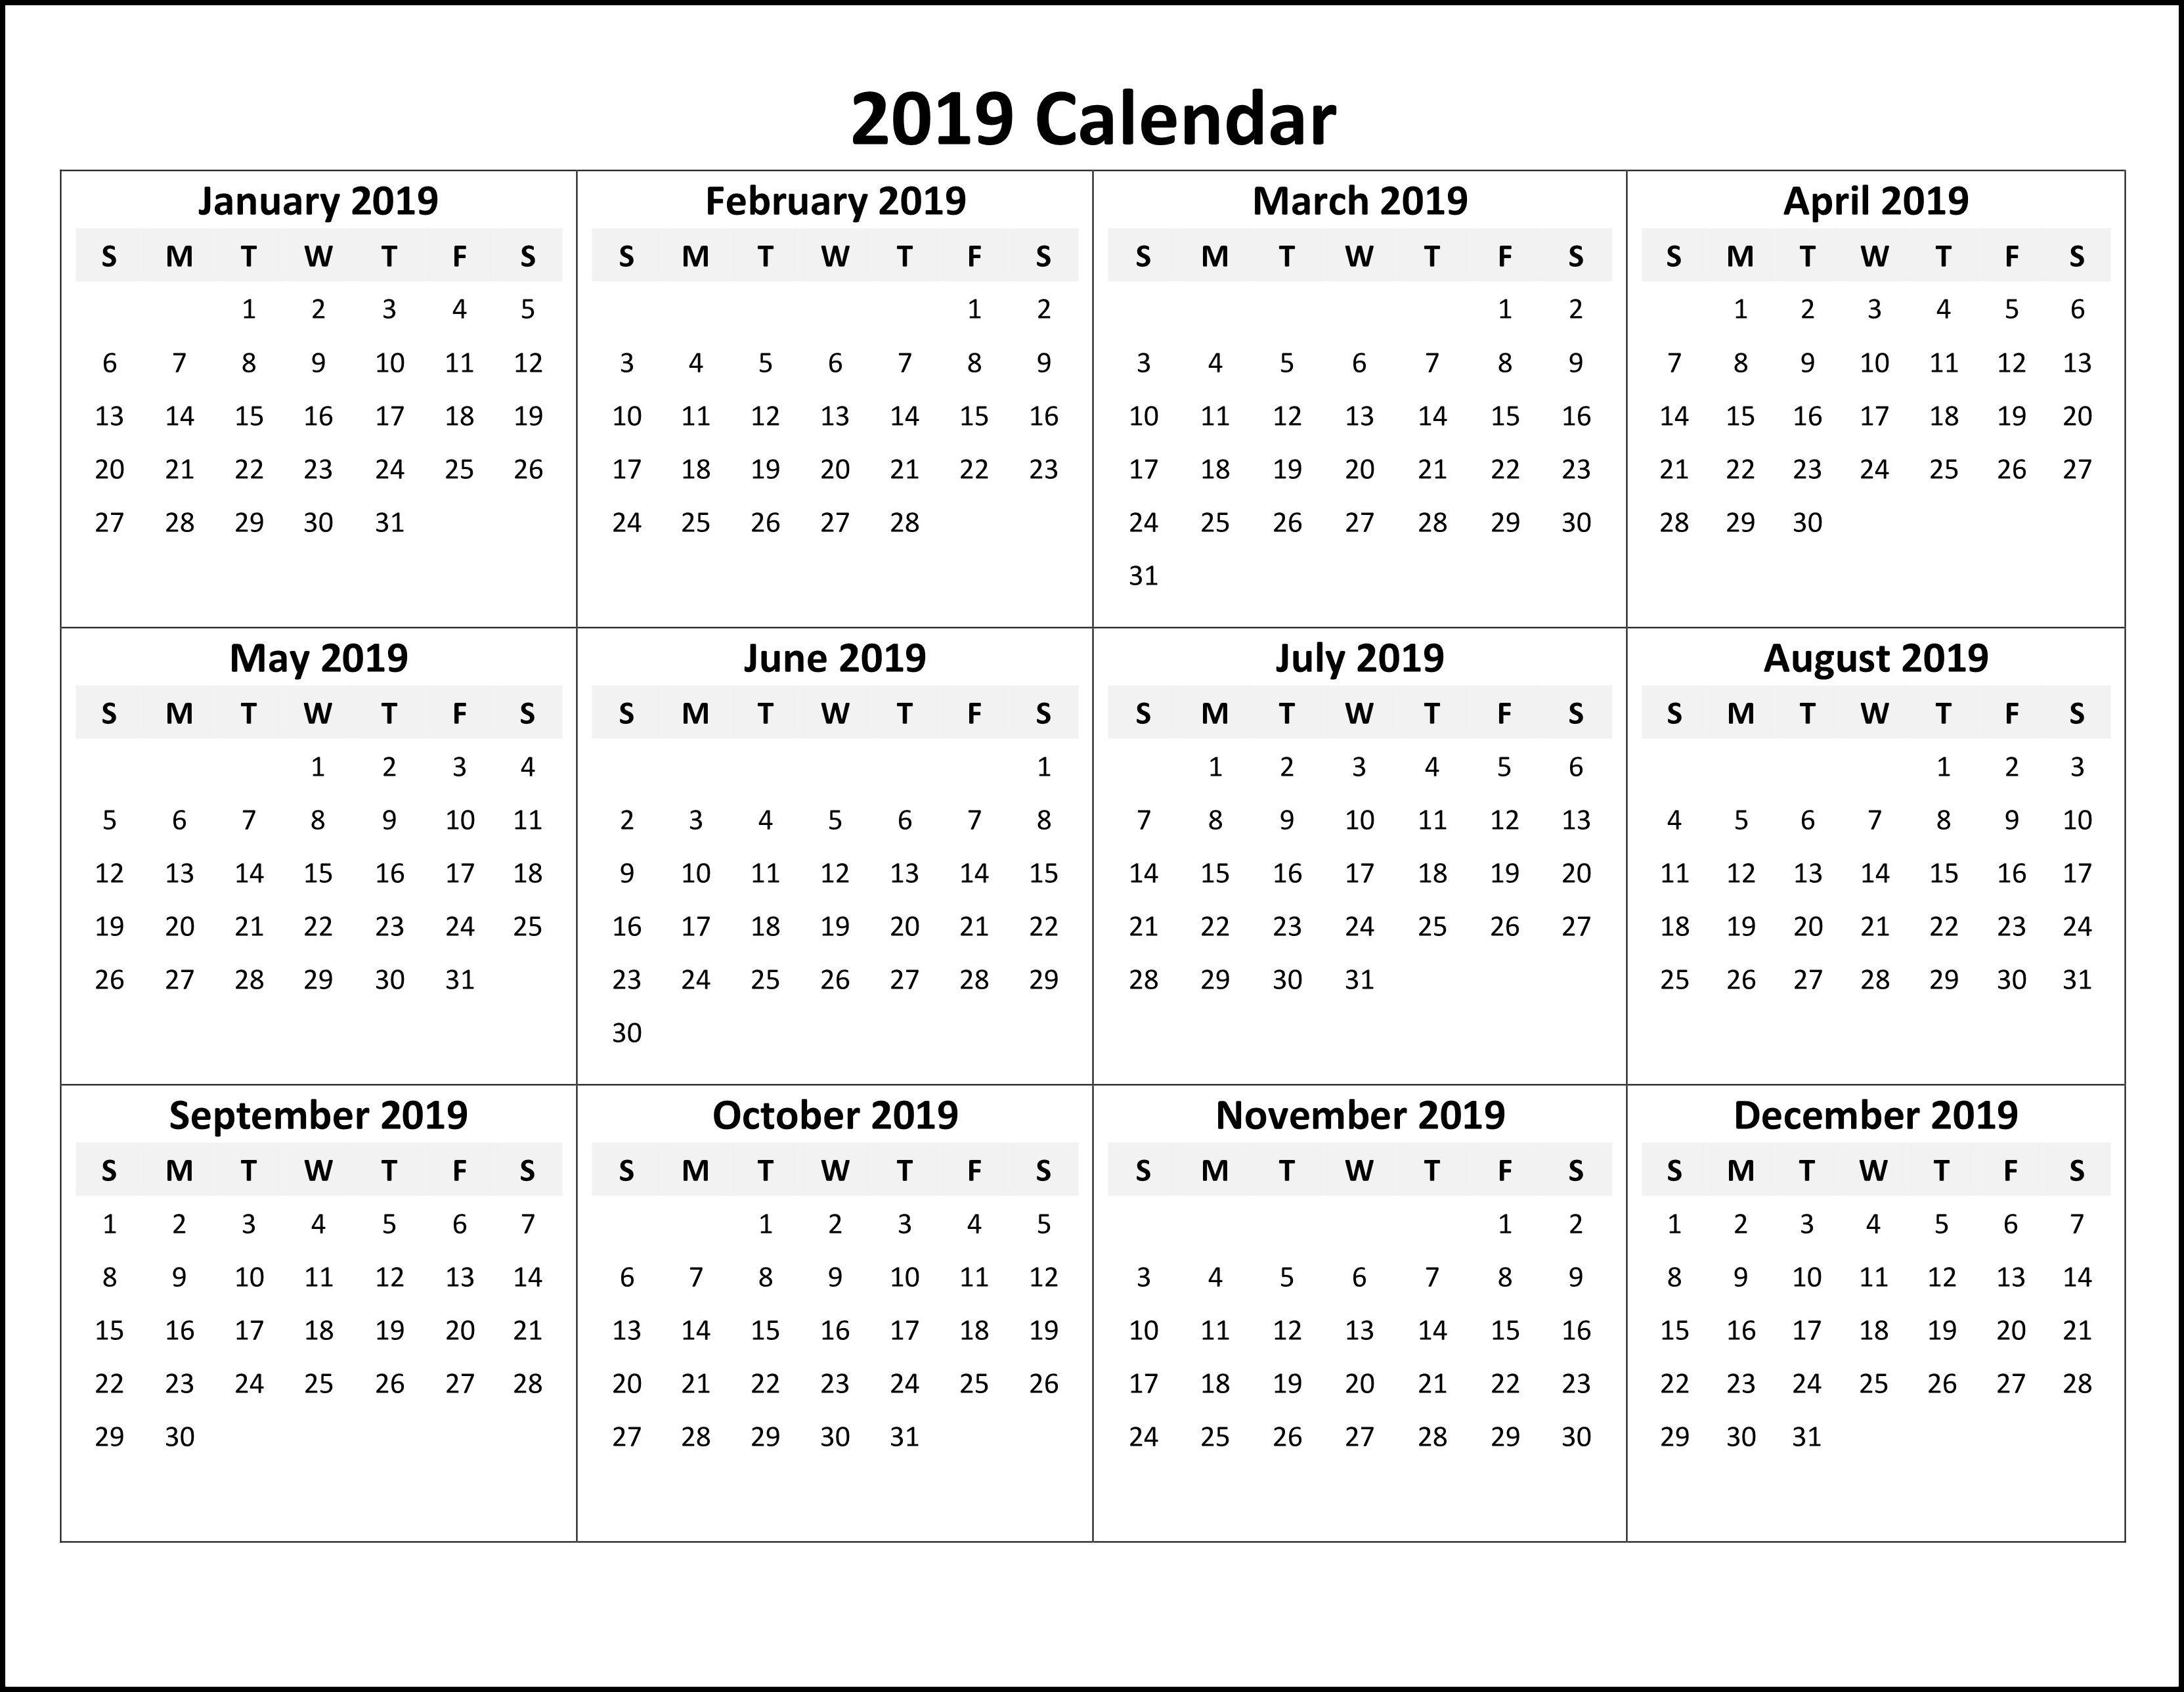 Online Printable Calendar 2019 #calendar2019 #printablecalendar2019 Calendar 2019 Online